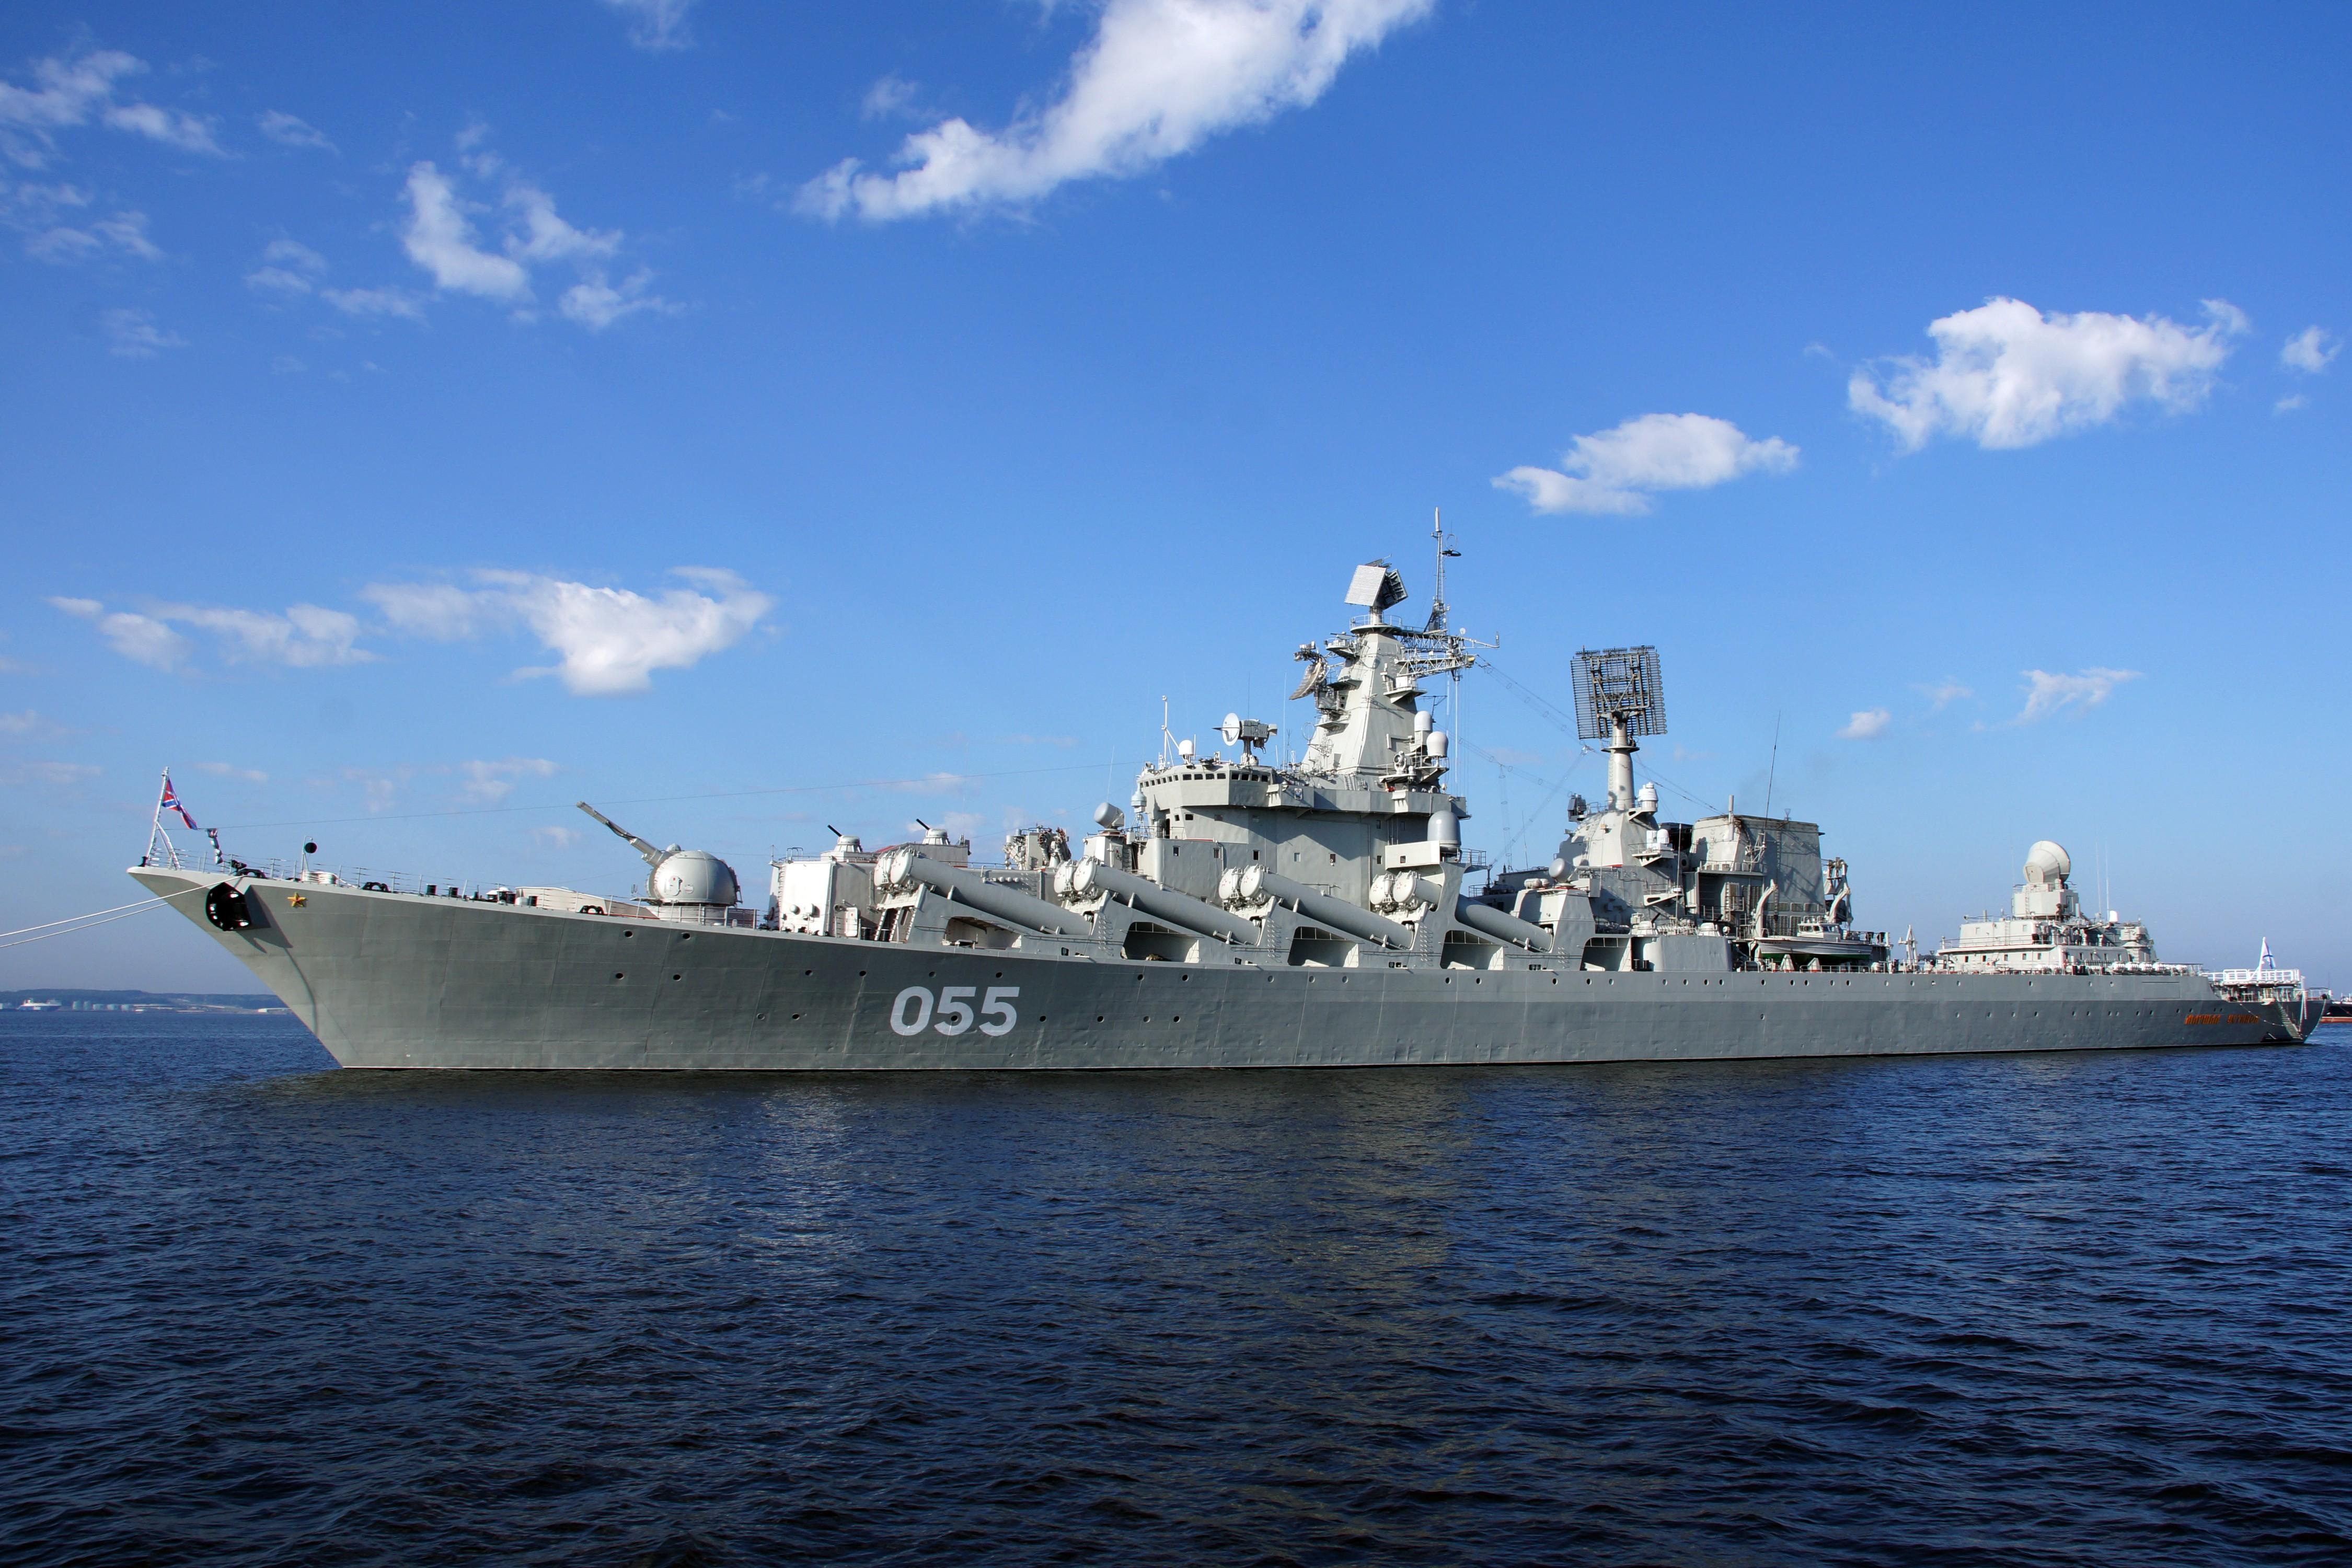 Project 1164 Atlant: Slava Class cruiser - Page 10 24-6505749-2018-07-24-08-24-28-dsc06206